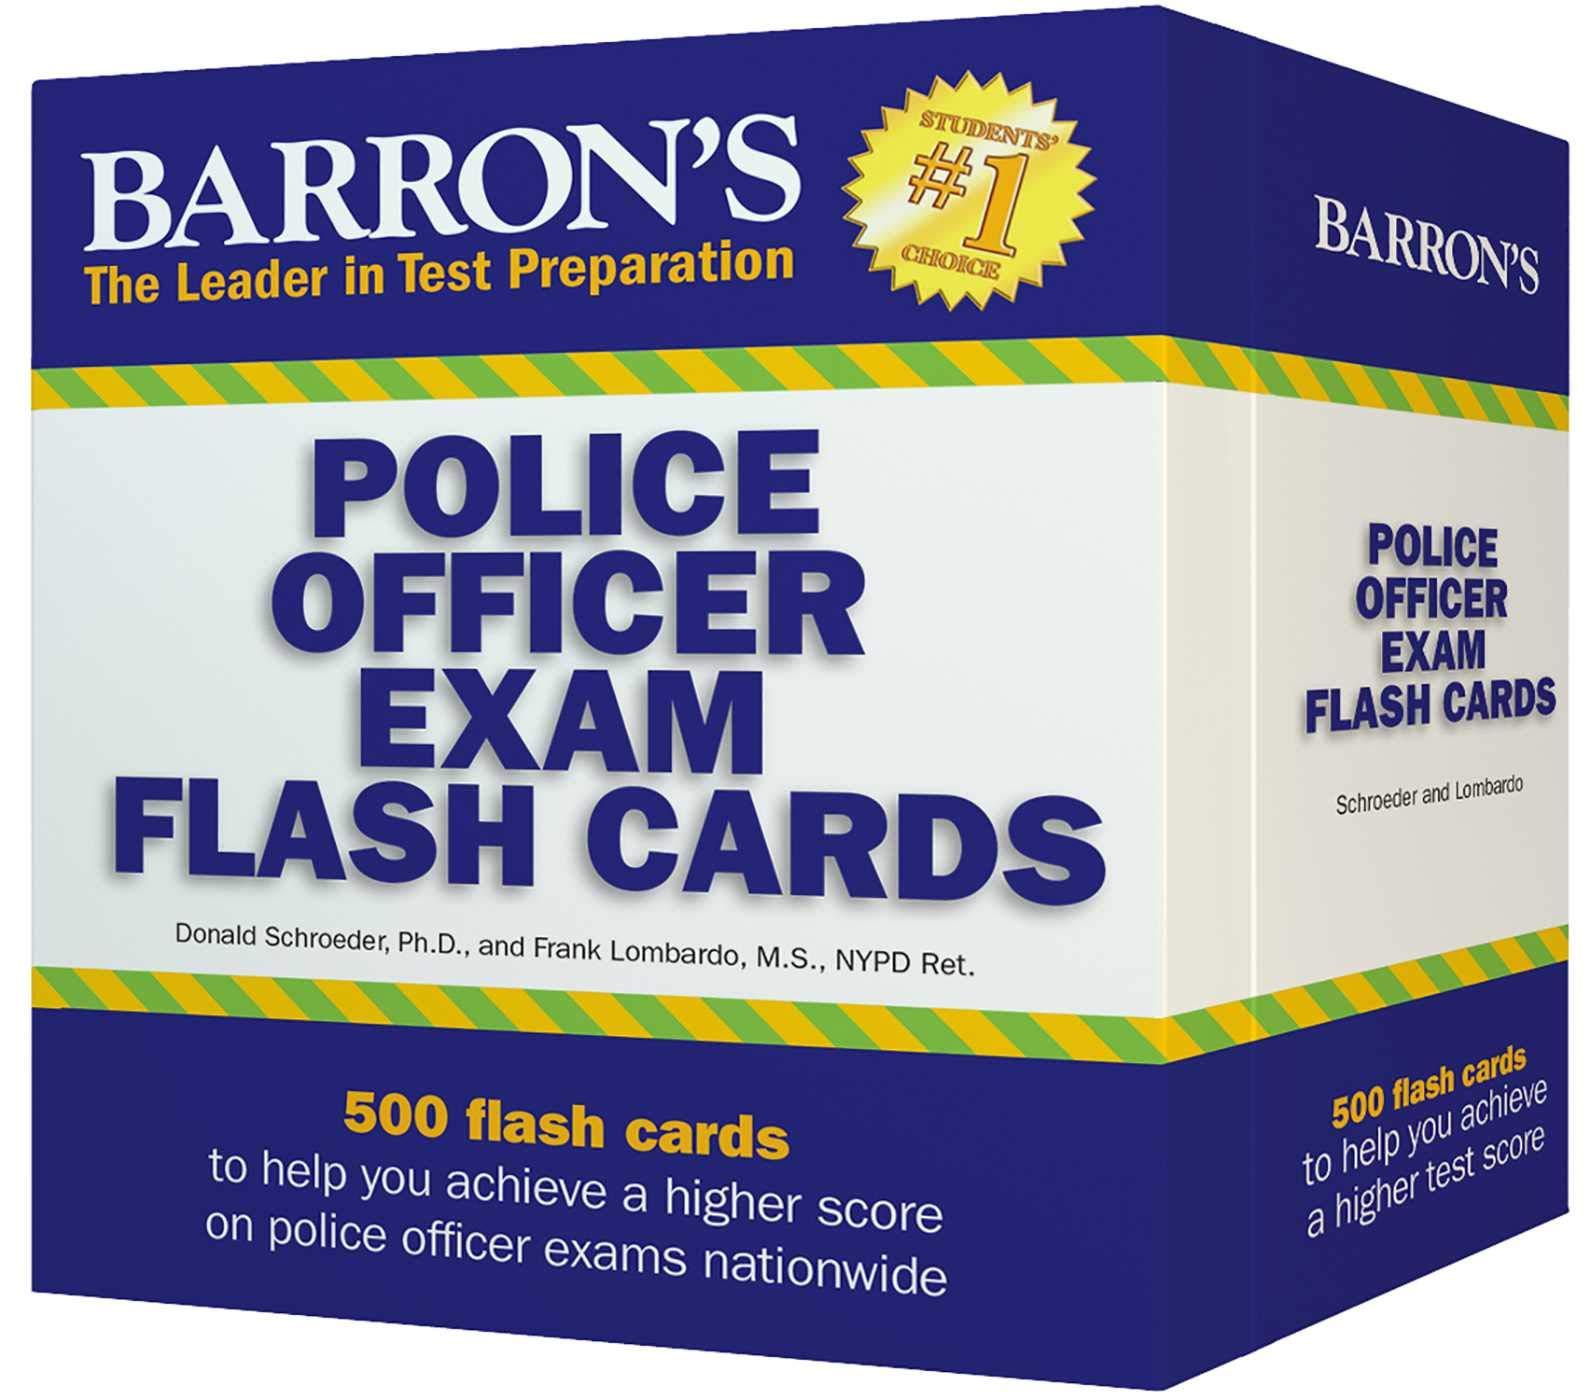 Barron's Police Officer Exam Flash Cards: Donald J. Schroeder Ph.D., Frank  Lombardo M.S. NYPrint Flashcards Ret.: 9781438077703: Amazon.com: Books